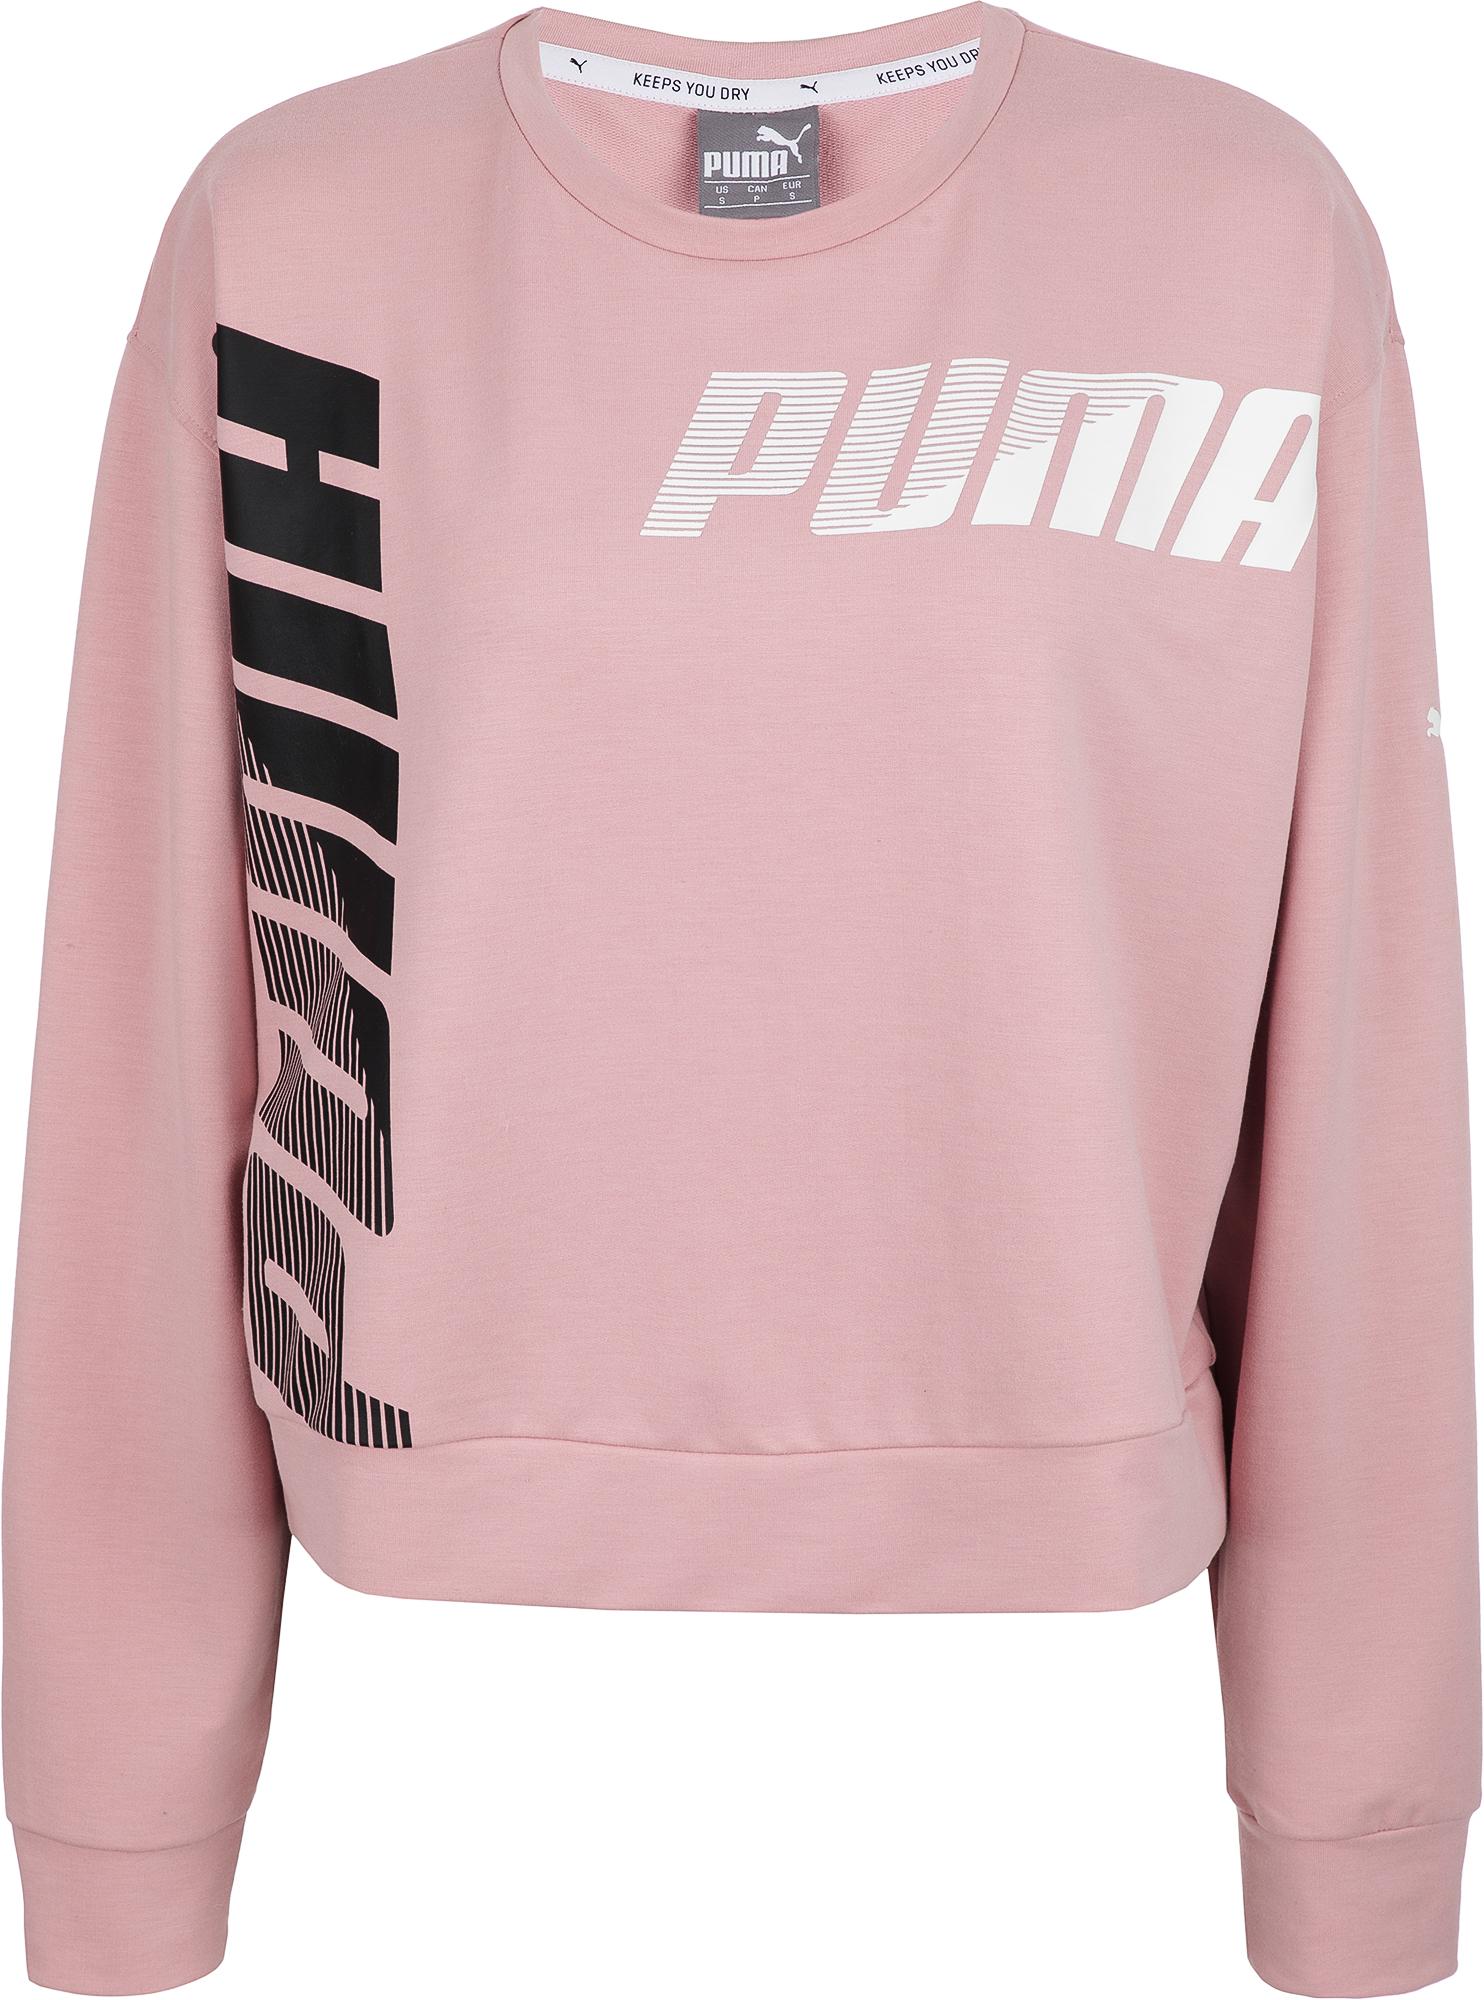 Puma Свитшот женский Puma Modern Sport Crew, размер 46-48 цены онлайн